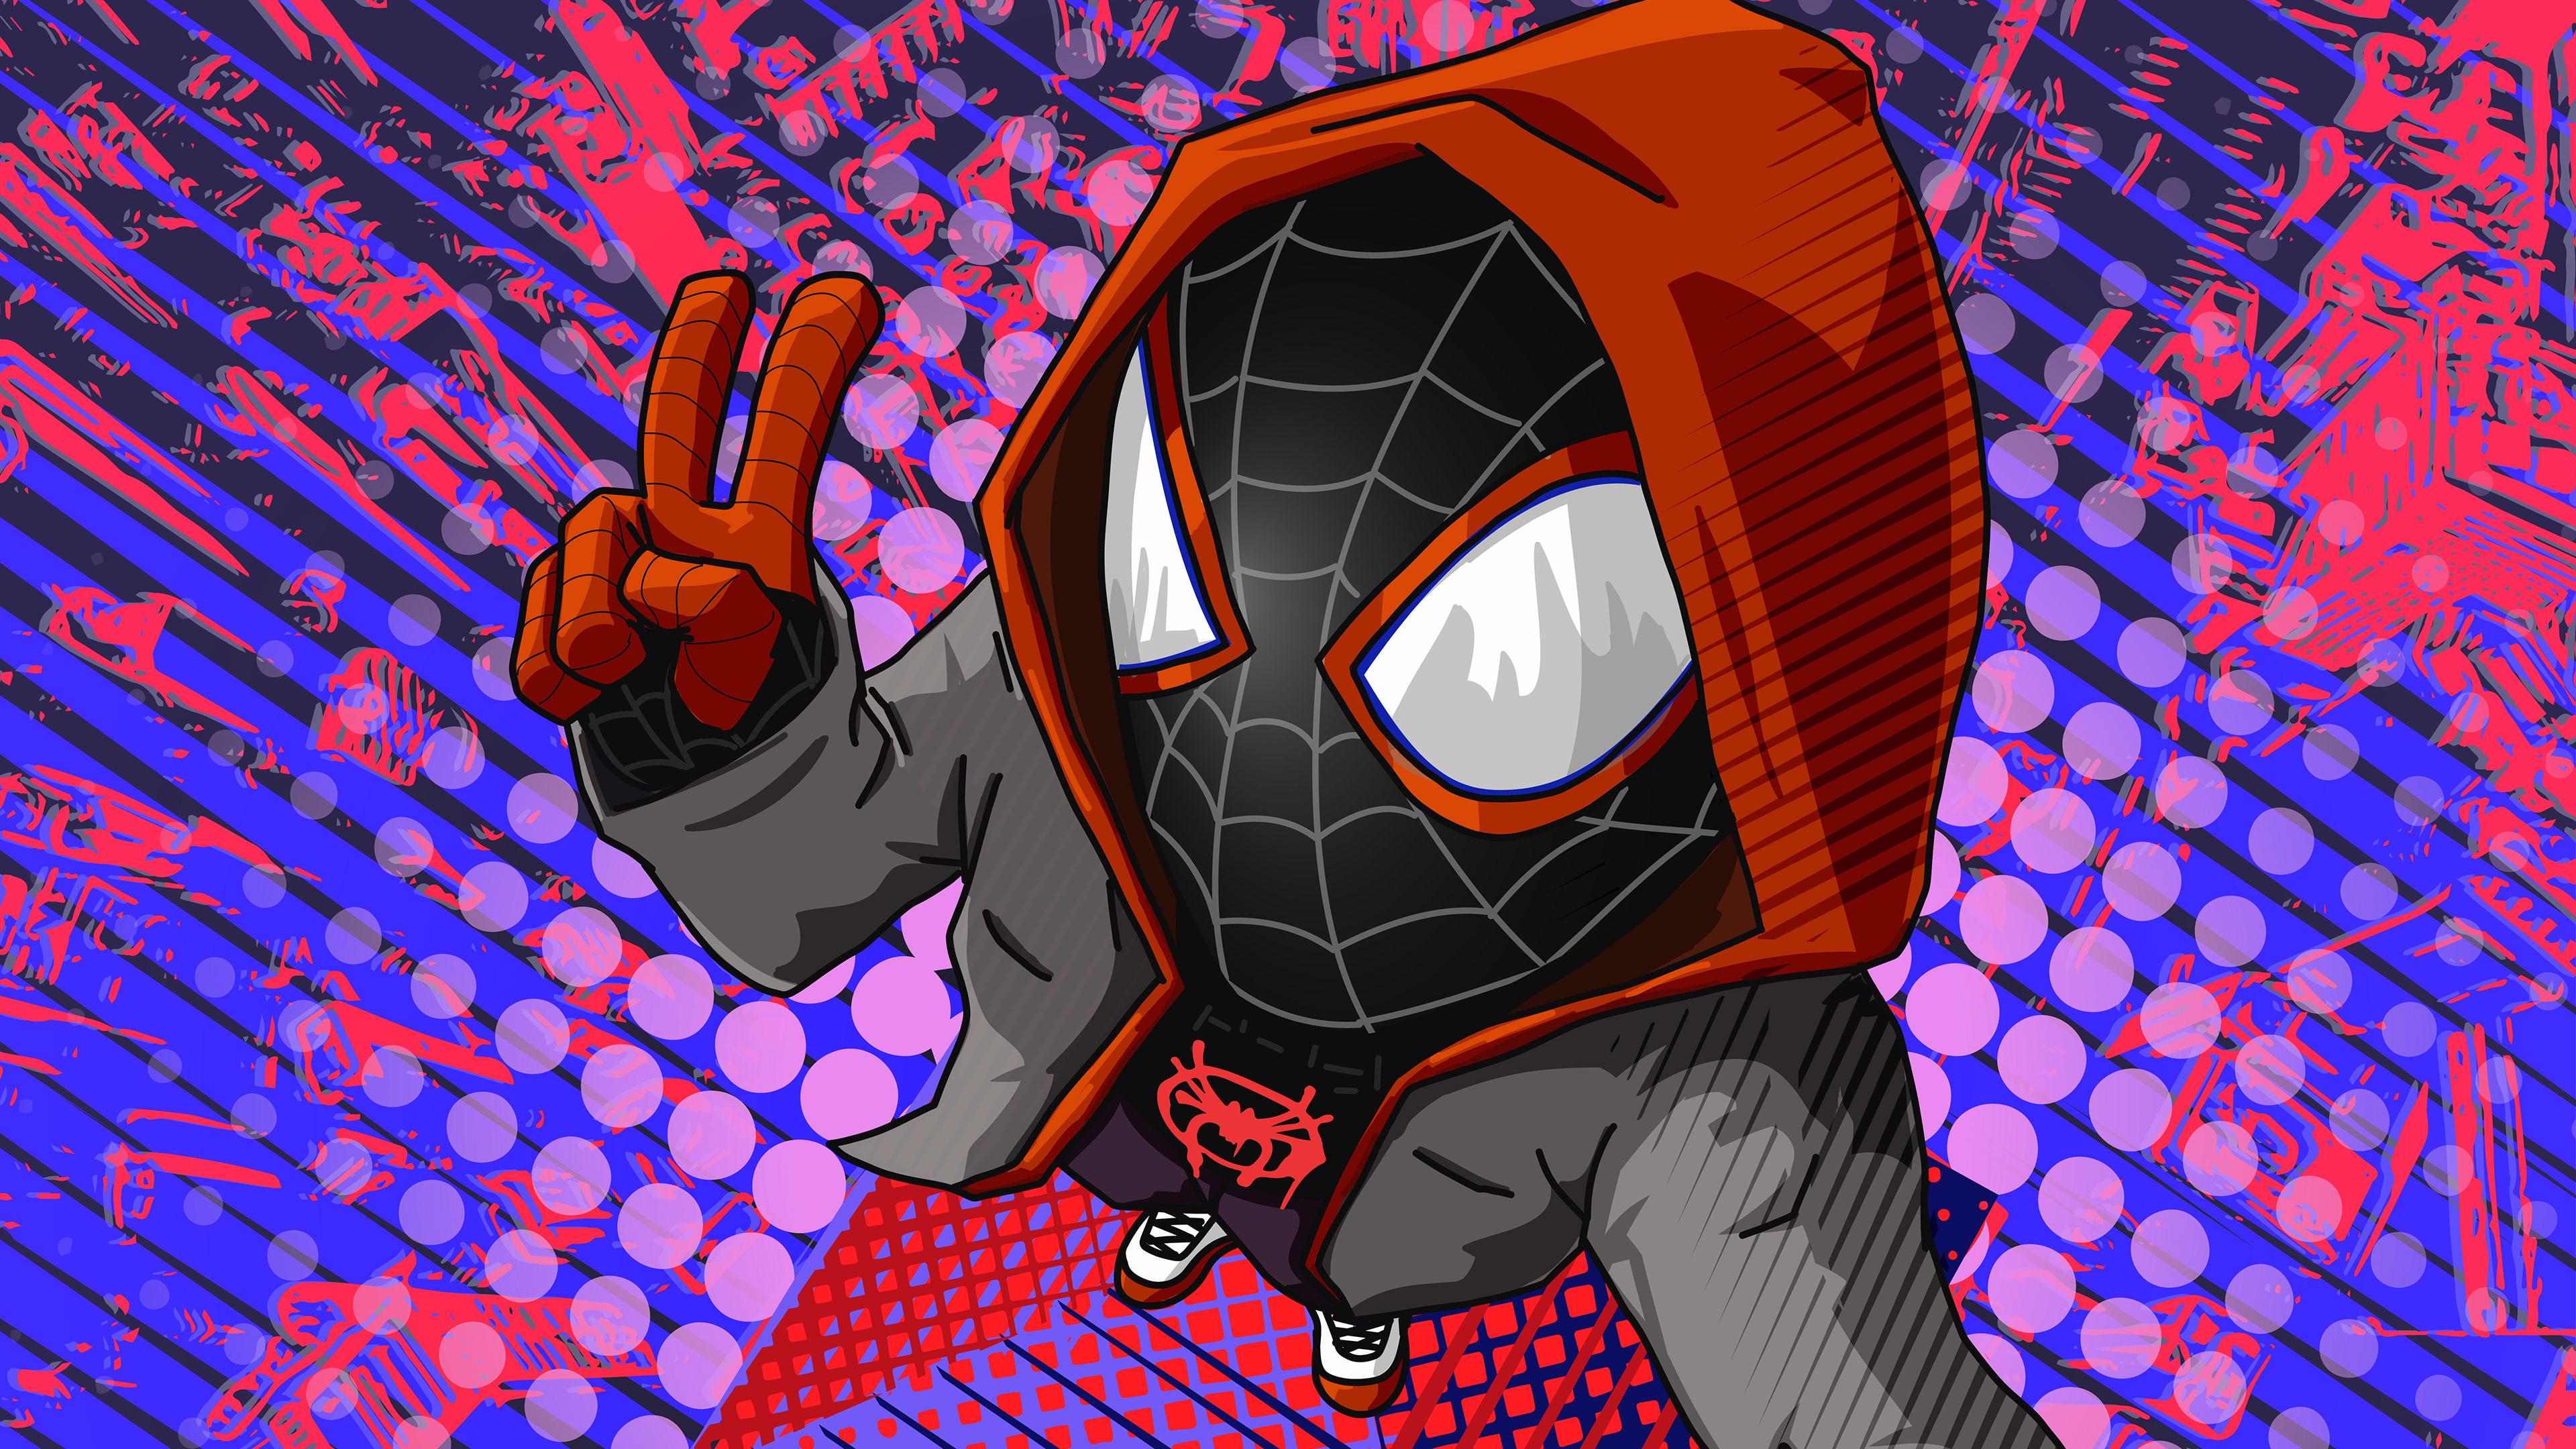 miles new spiderman 4k 1553071283 - Miles New Spiderman 4k - superheroes wallpapers, spiderman wallpapers, spiderman into the spider verse wallpapers, hd-wallpapers, digital art wallpapers, artwork wallpapers, artist wallpapers, 4k-wallpapers